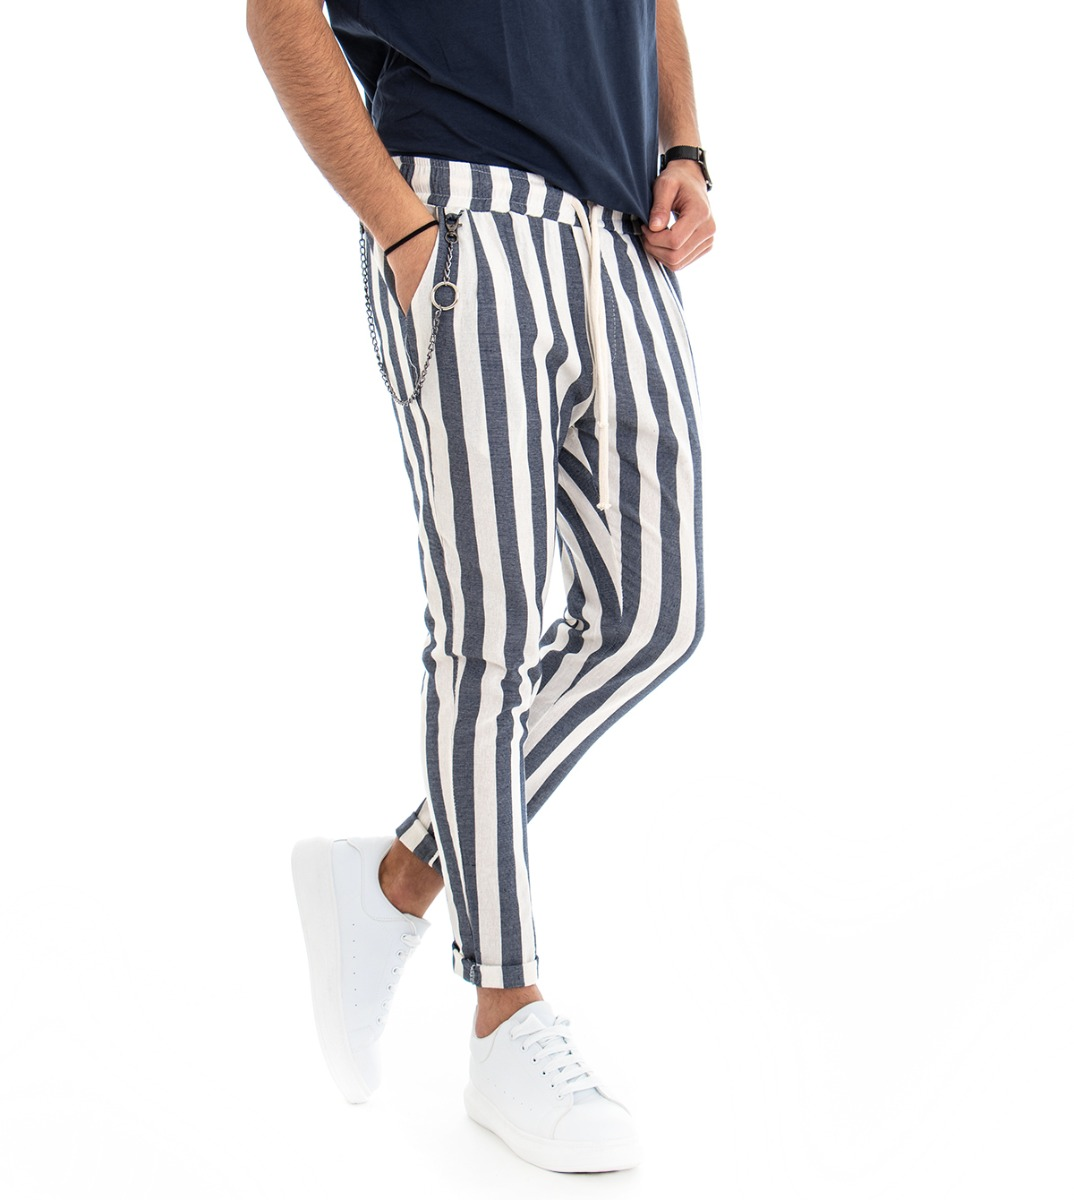 Responsable Pantalone Uomo Blu Fantasia A Righe Elastico Rigato Tasca America Giosal